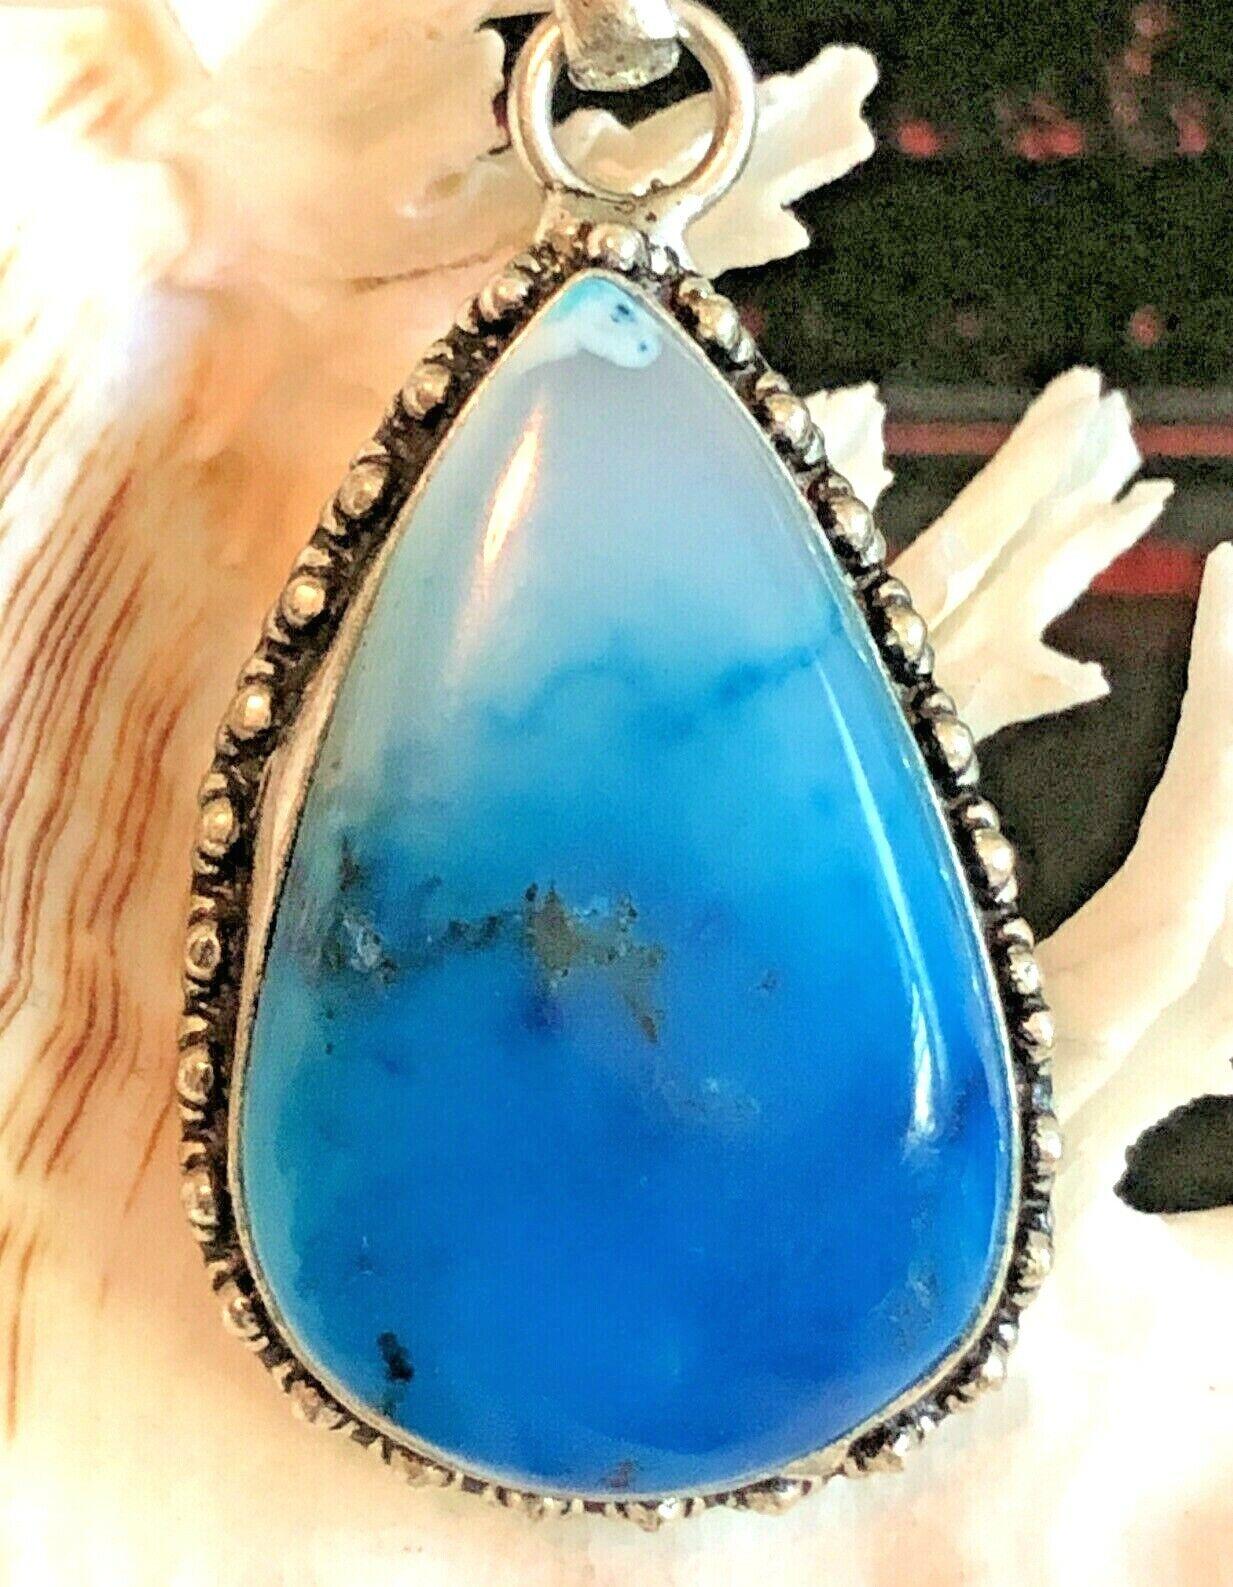 Large 2 Marine Blue Dendrite Opal Pendant Teardrop .925 Sterling Silver - $34.00